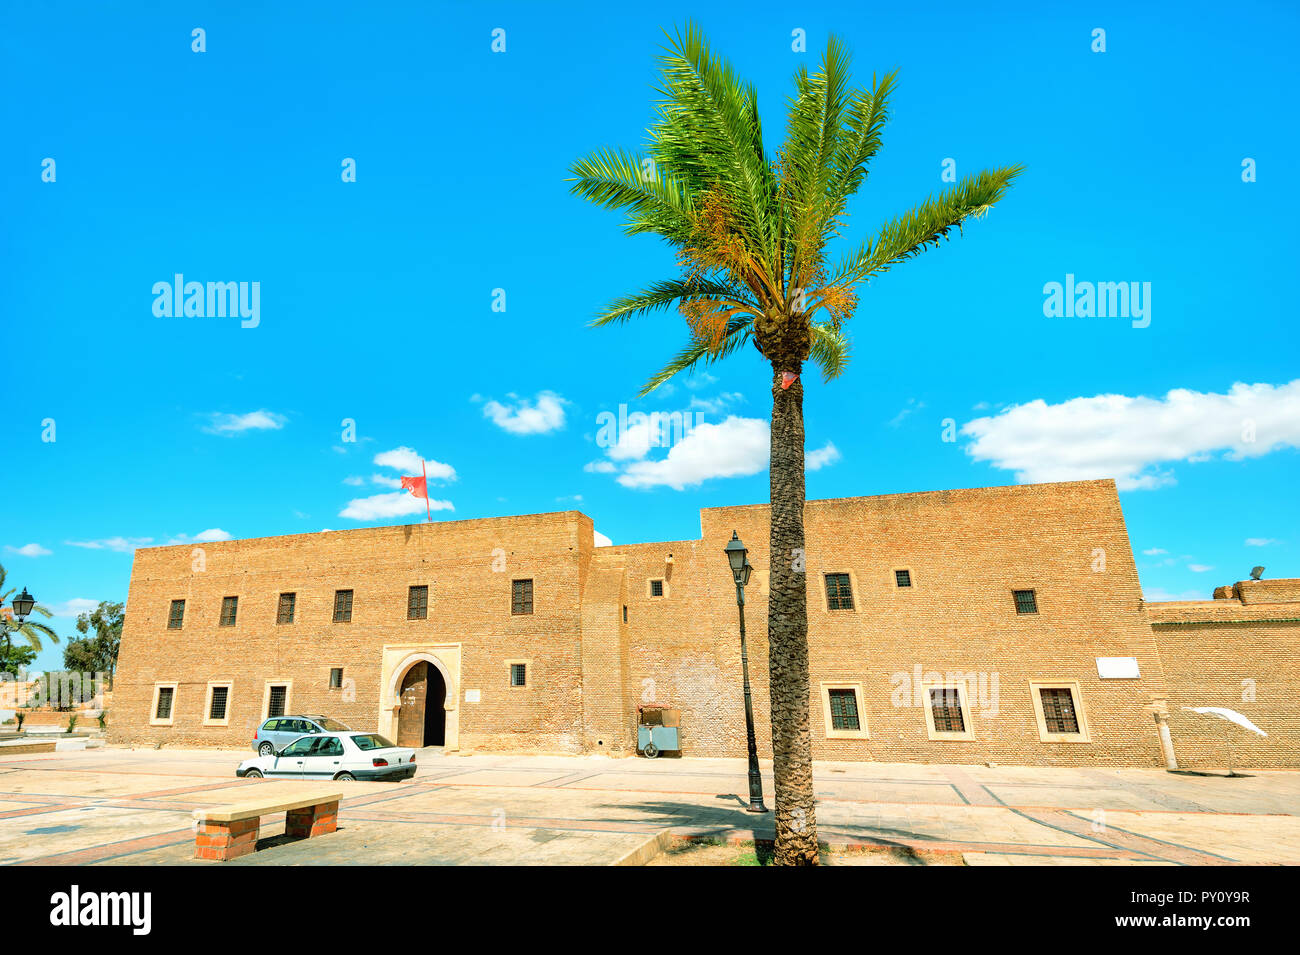 Facade of Barbier Mosque (Sidi Sahab Mausoleum) in Kairouan. Tunisia, North Africa - Stock Image